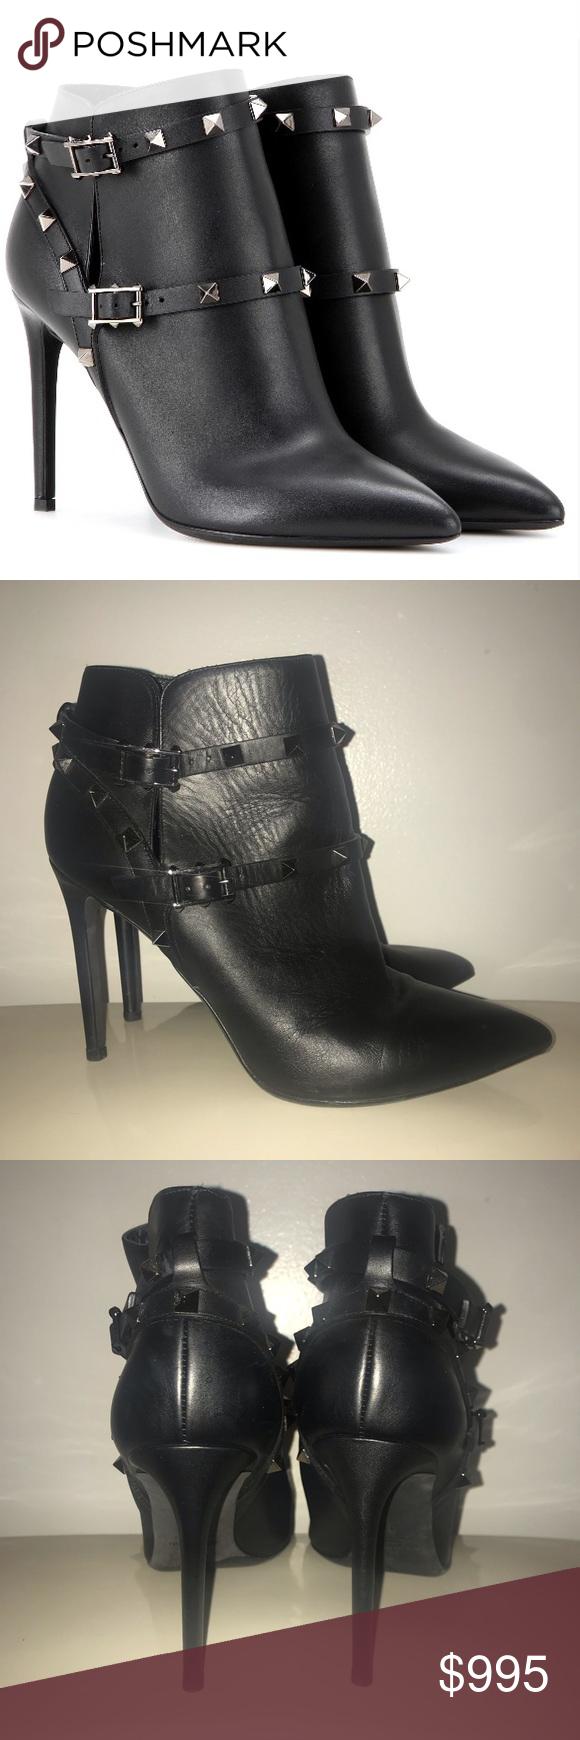 94f8292629453 🎉HOST PICK🎉 Valentino Rockstud Noir Ankle Boots Valentino Rockstud Noir  Black Leather Ankle Booties